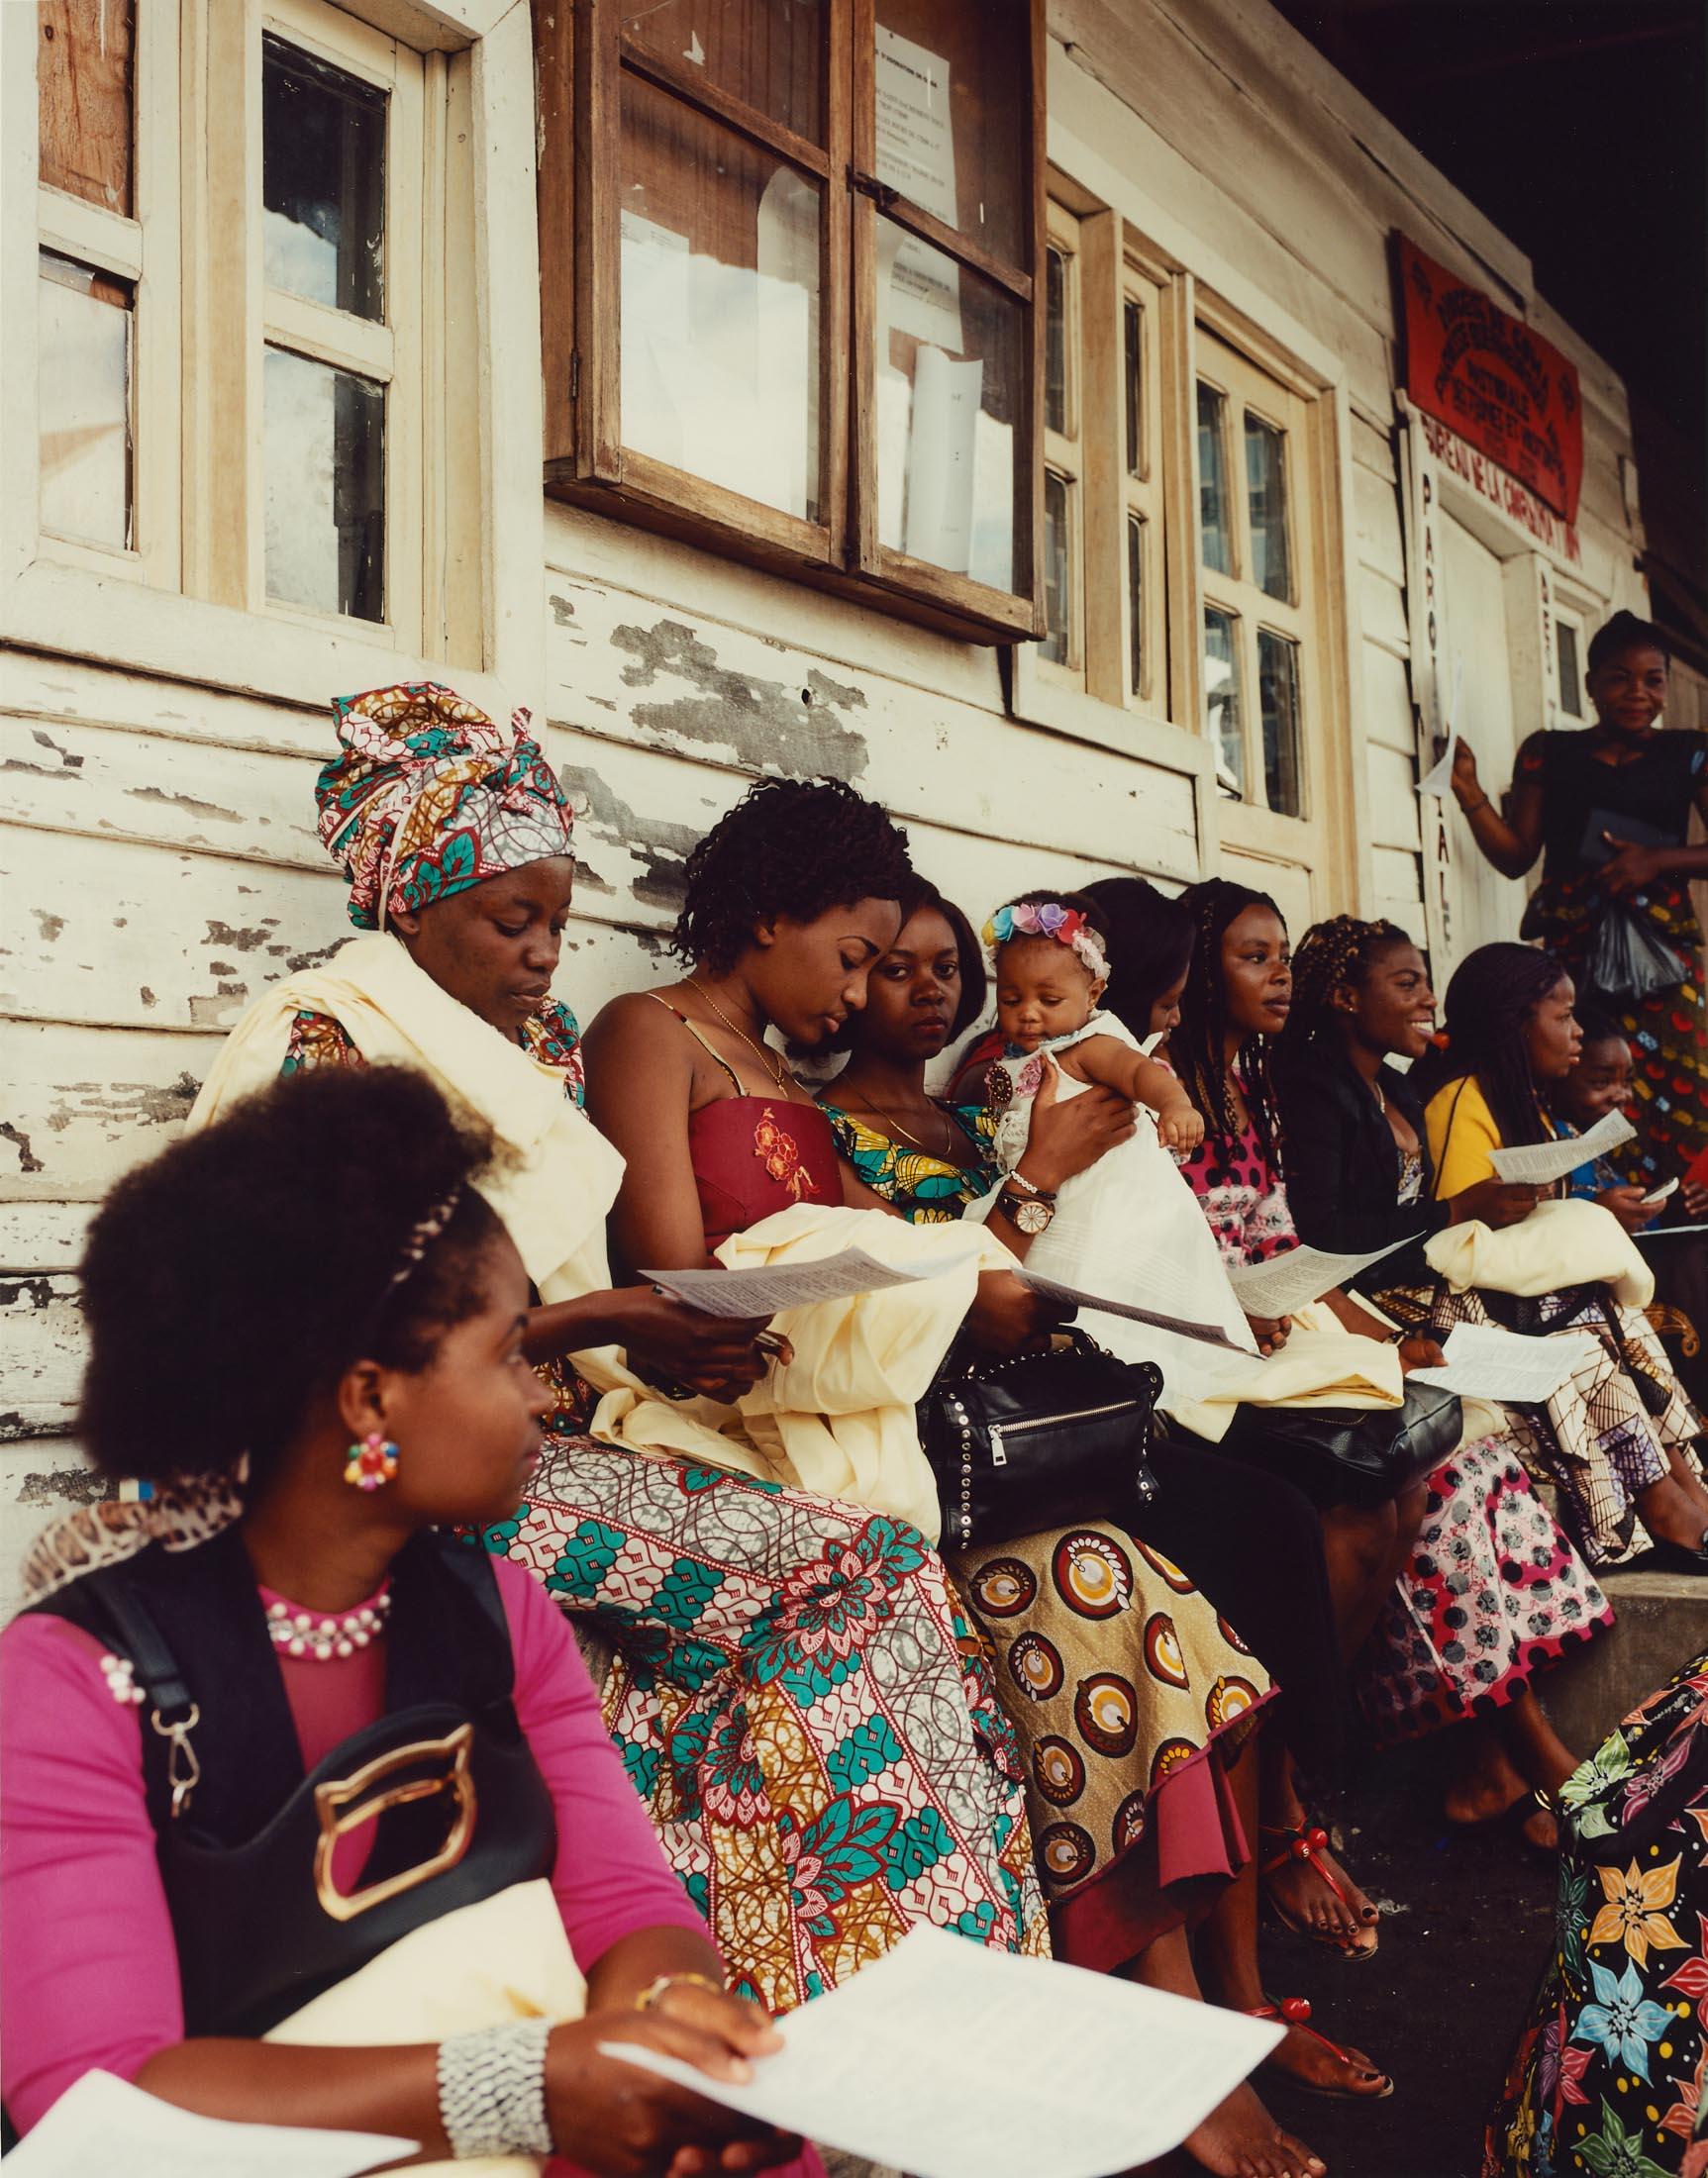 Choir girls during rehearsal at the church of the Anuarite de Goma, North Kivu Province, Eastern DRC.